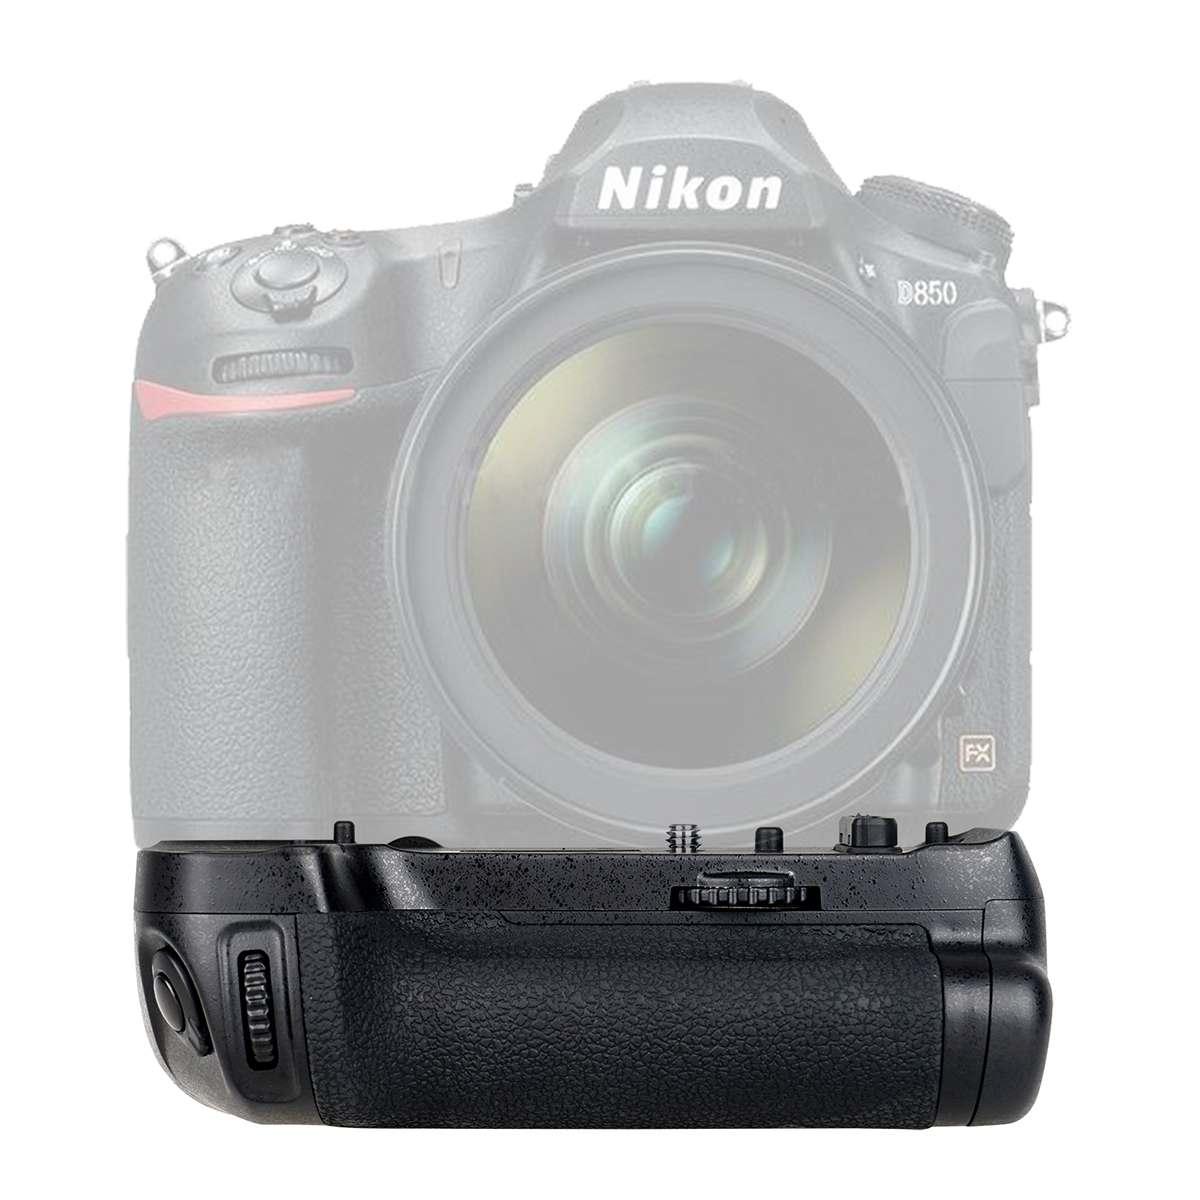 Mcoplus Multi Power Battery Grip MB-D18 Replacement EN-EL15 For Nikon D850 1 X Rechargeable Li-ion Batteries Or 8 X AA Batteries